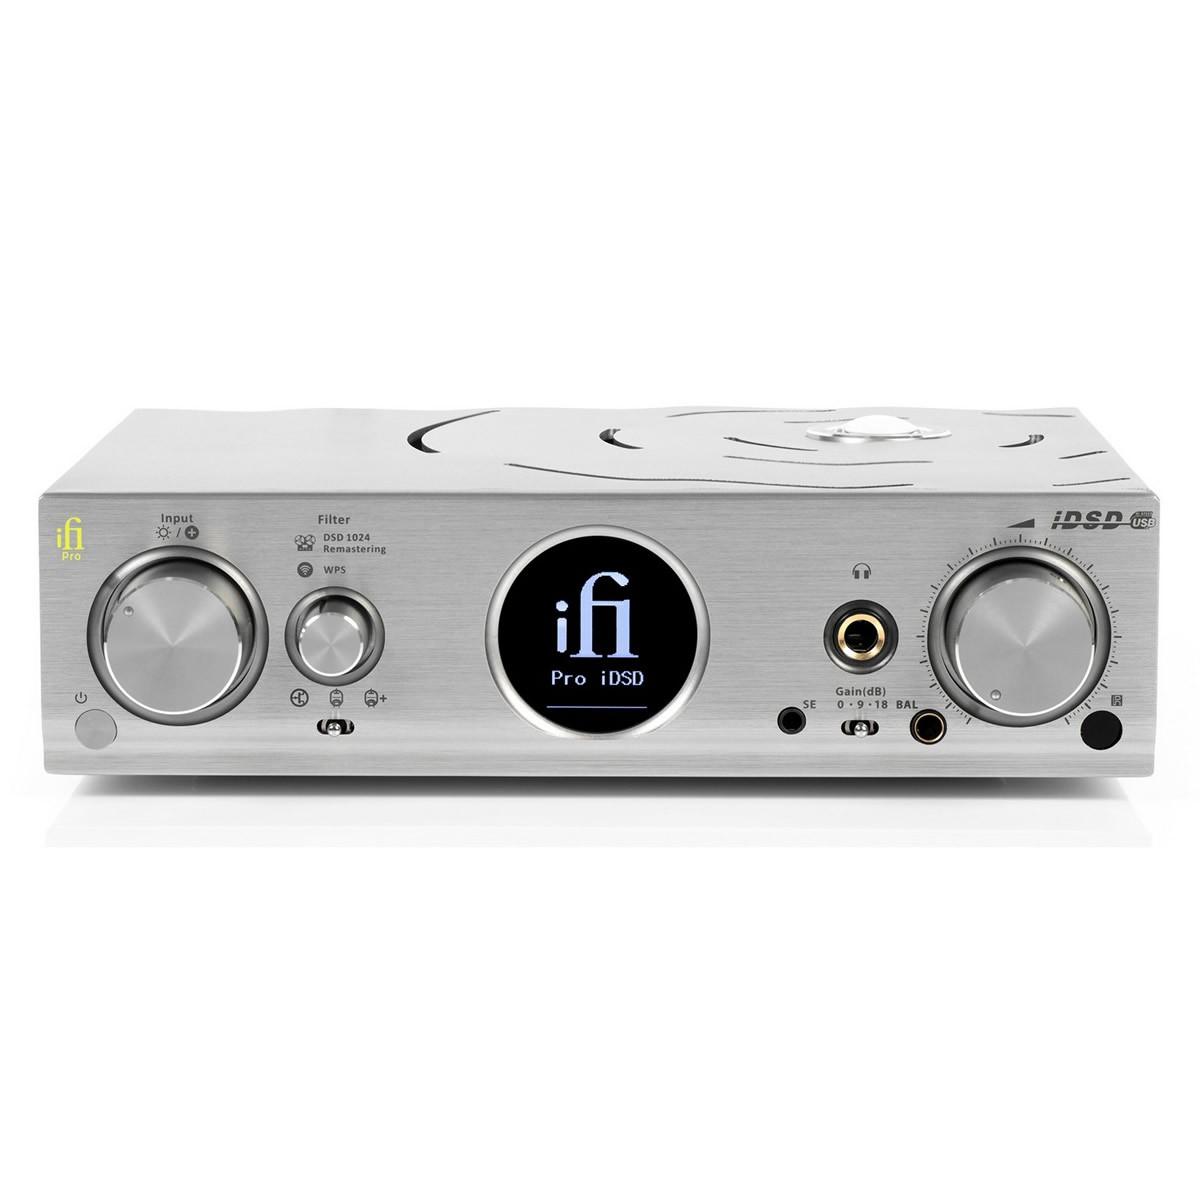 IFI AUDIO PRO iDSD V2 DAC BitPerfect 4x Burr Brown 32bit 768kHz DSD1024 Balanced